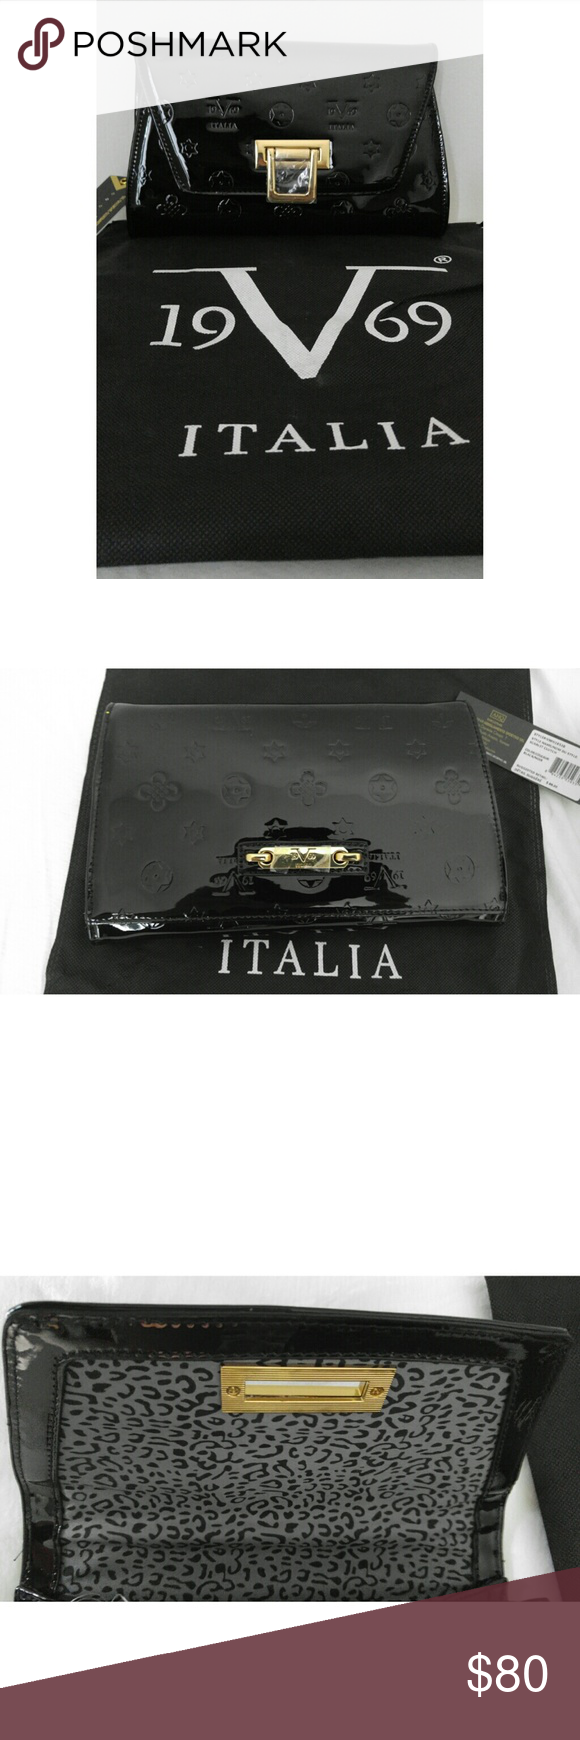 cd3ad9ce Versace 19.69 Italia Black Signature Clutch Versace 19.69 or V 19.69 ...